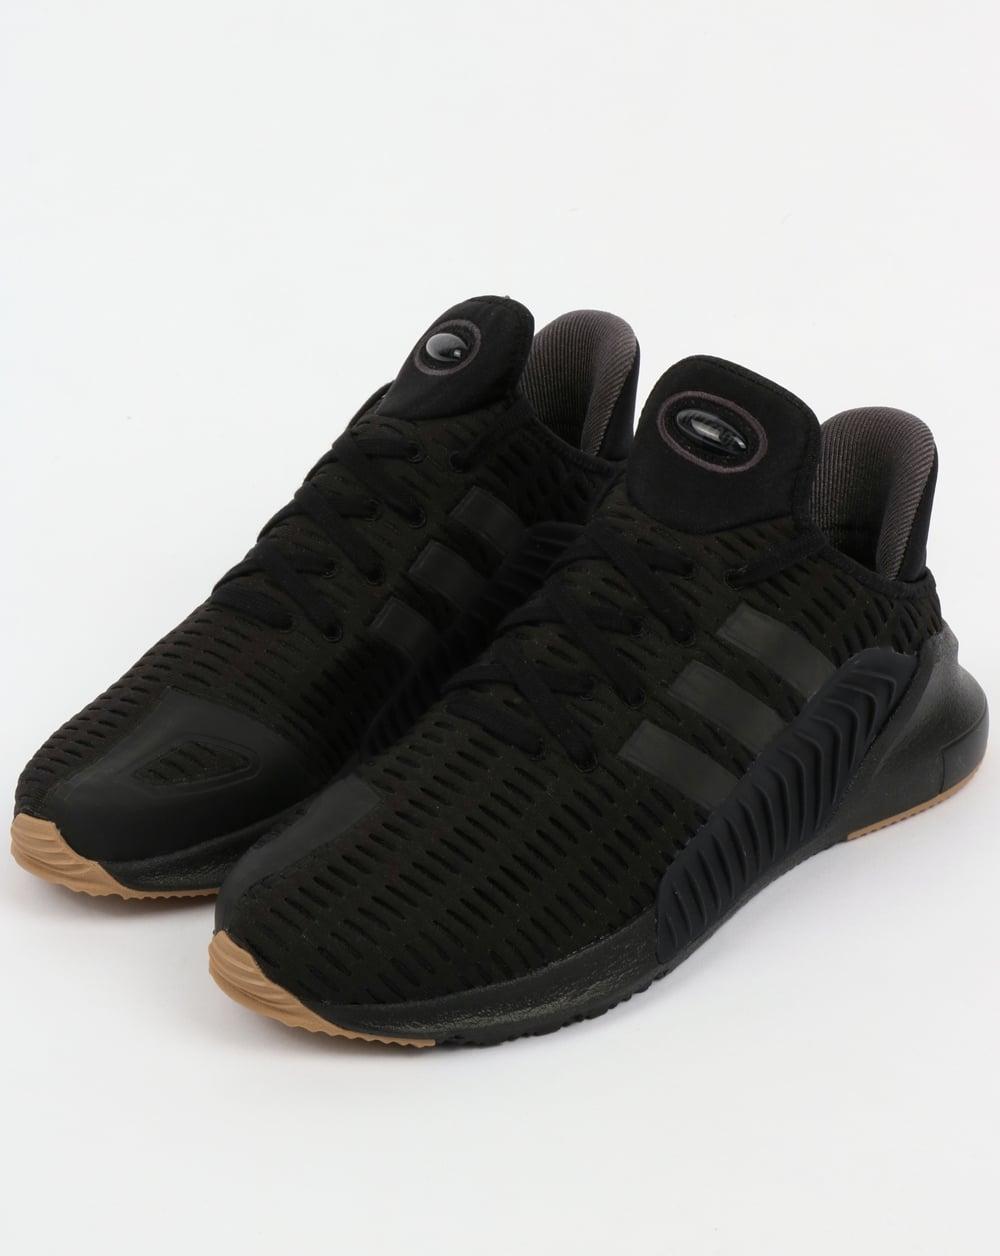 adidas climacool black gum